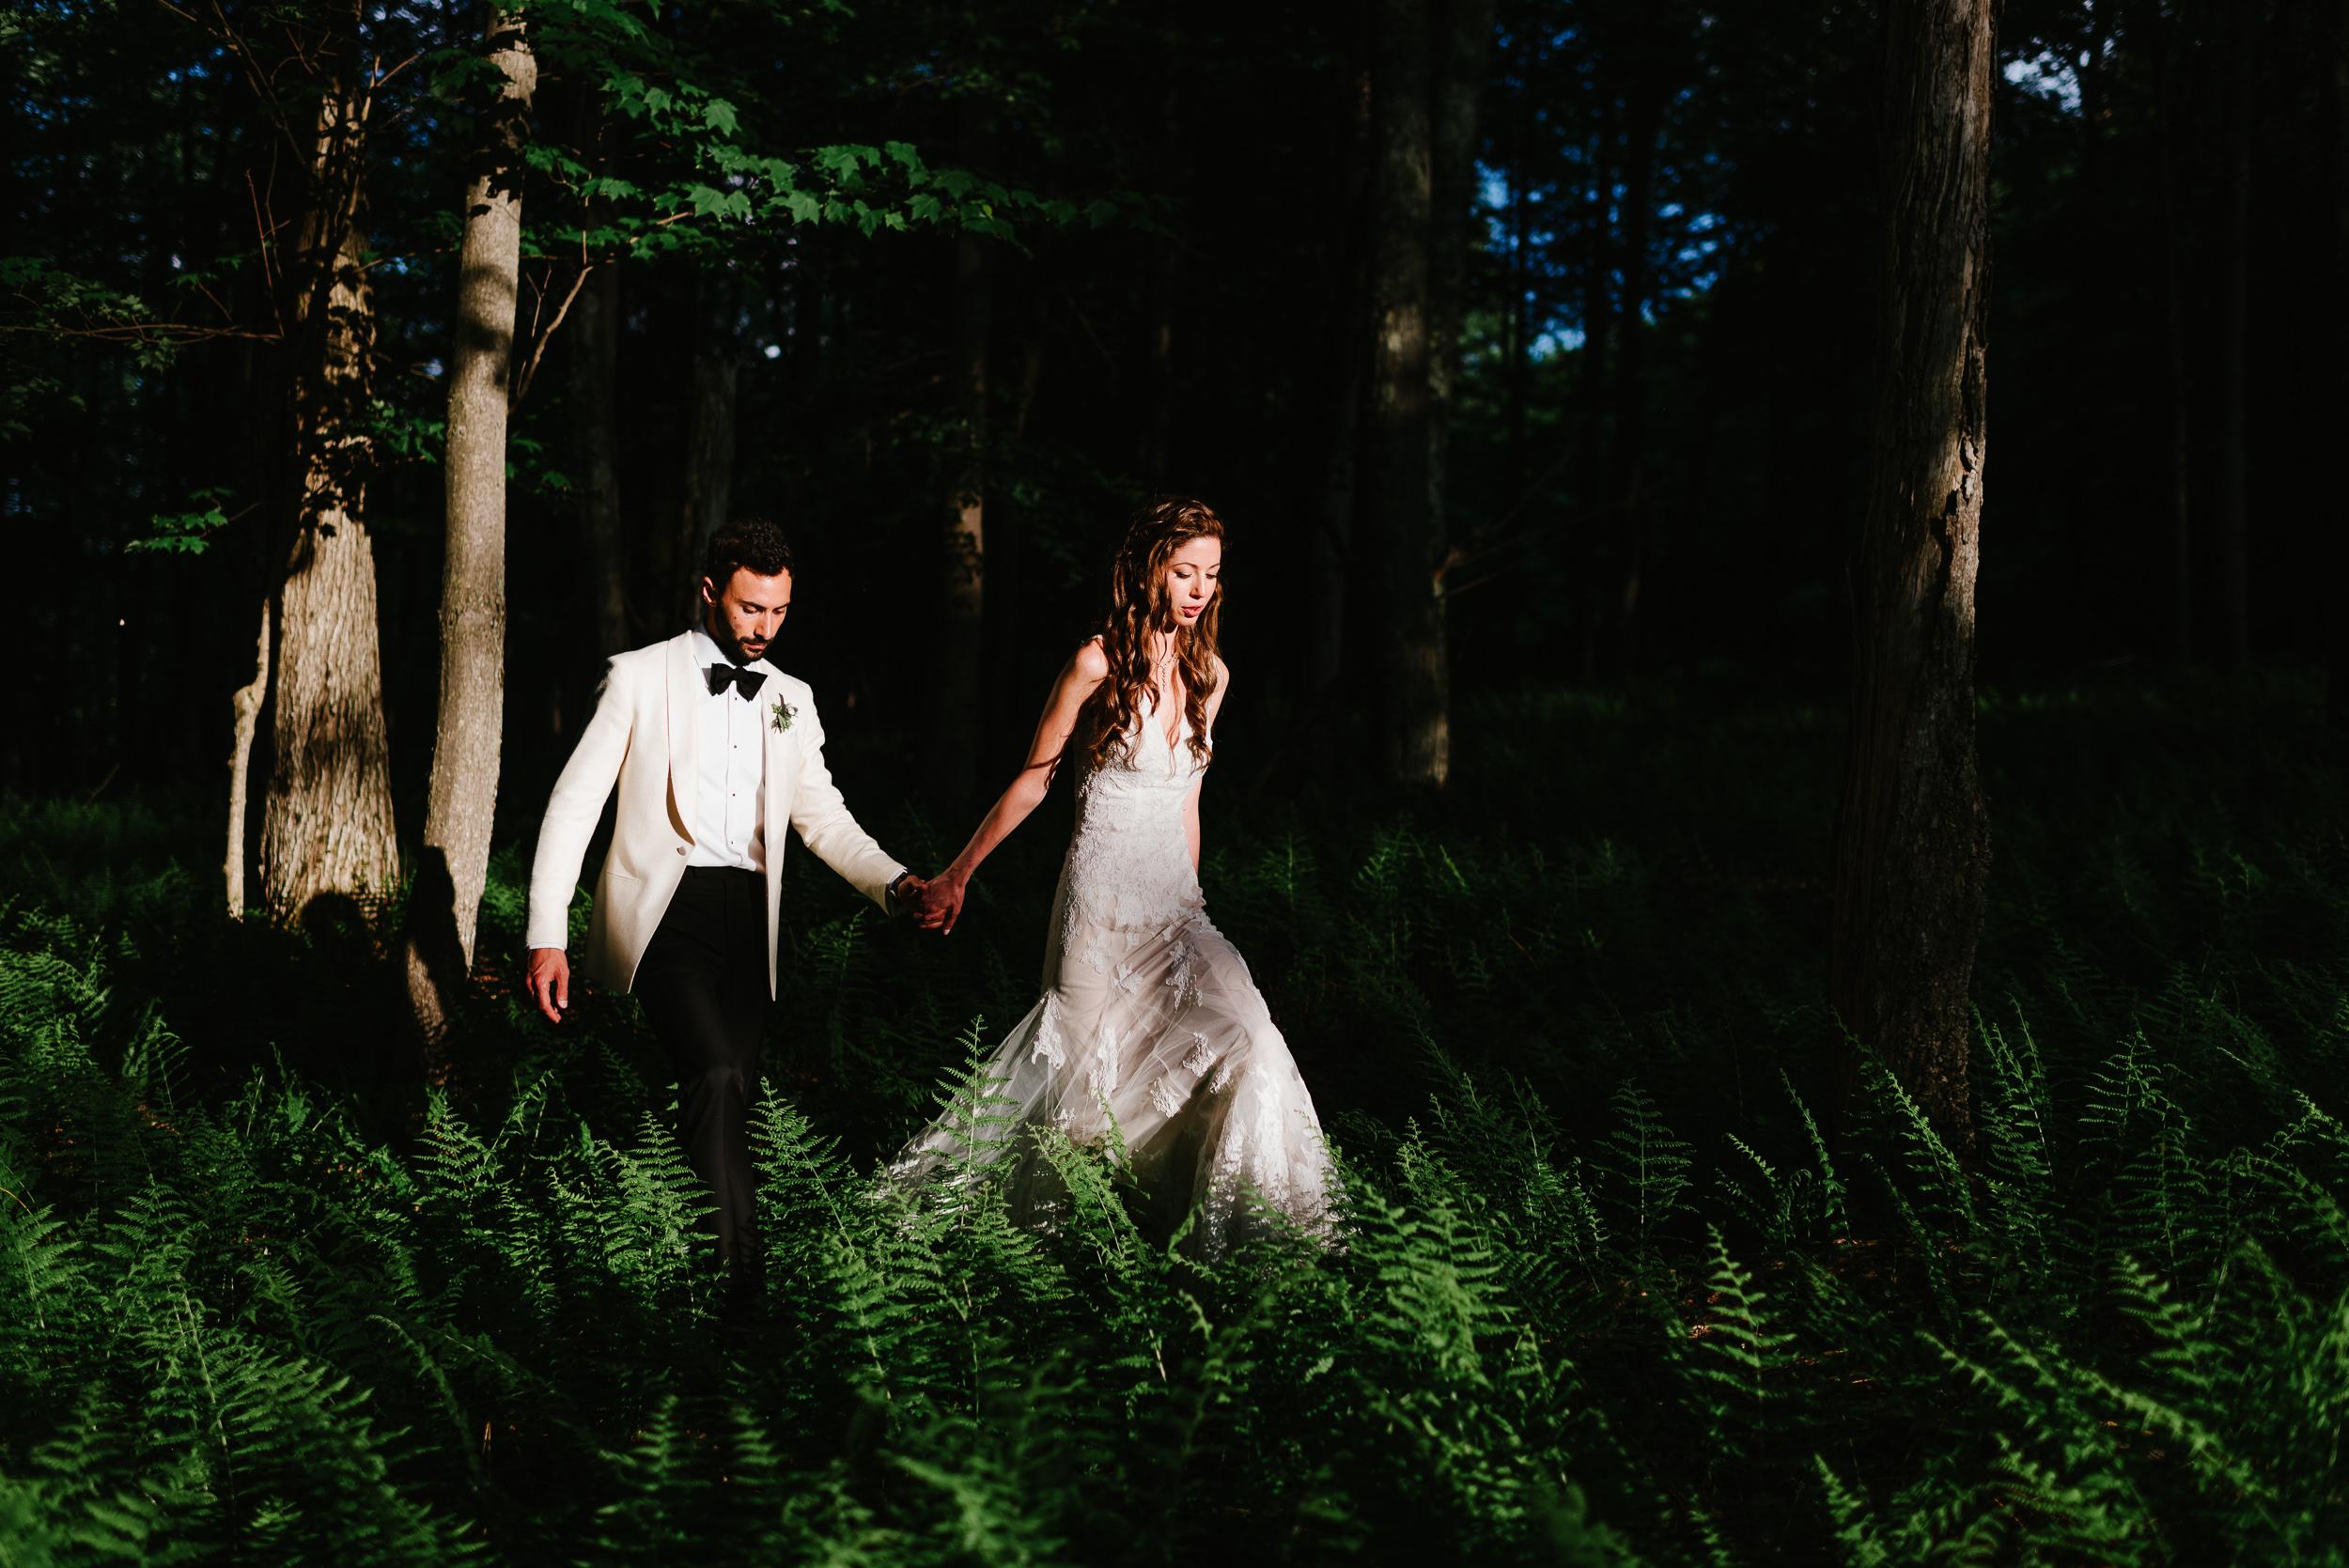 066-Handsome Hollow Wedding Photos Handsome Hollow Wedding Air BNB Wedding Brooklyn Wedding Photographer.jpg